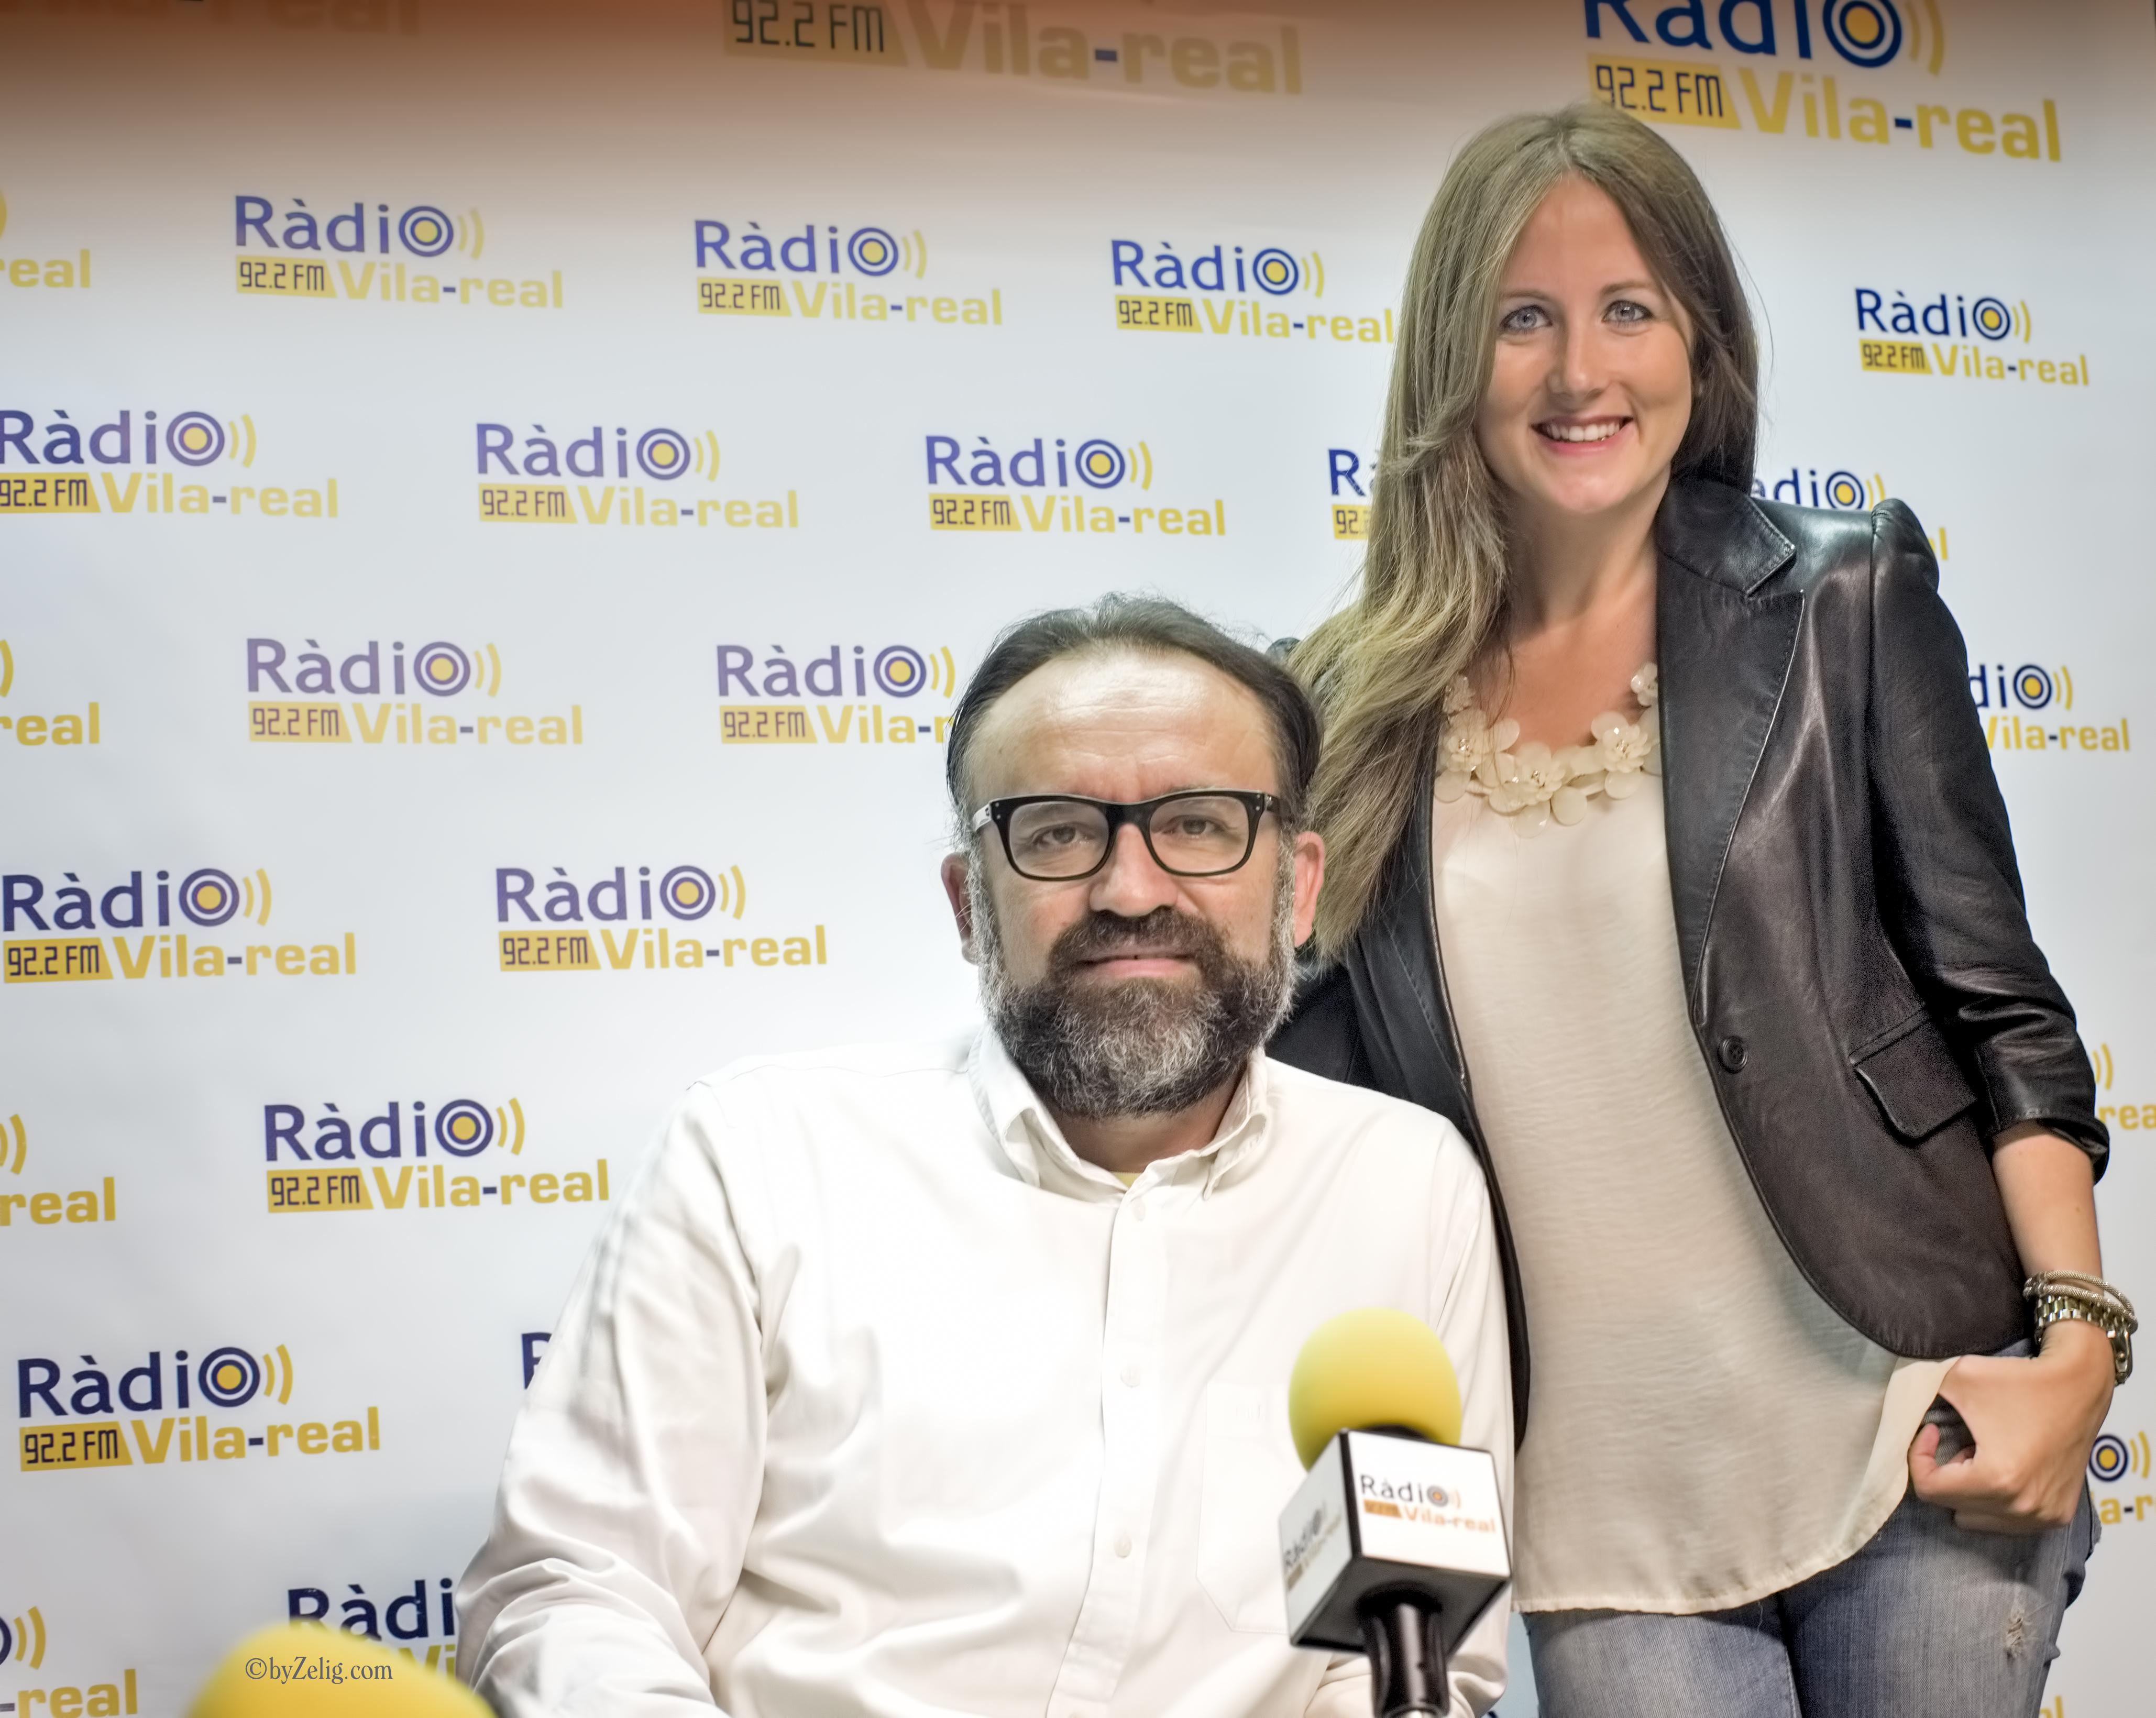 Esports Radio Vila-real. Programa del 20 de febrero de 2017